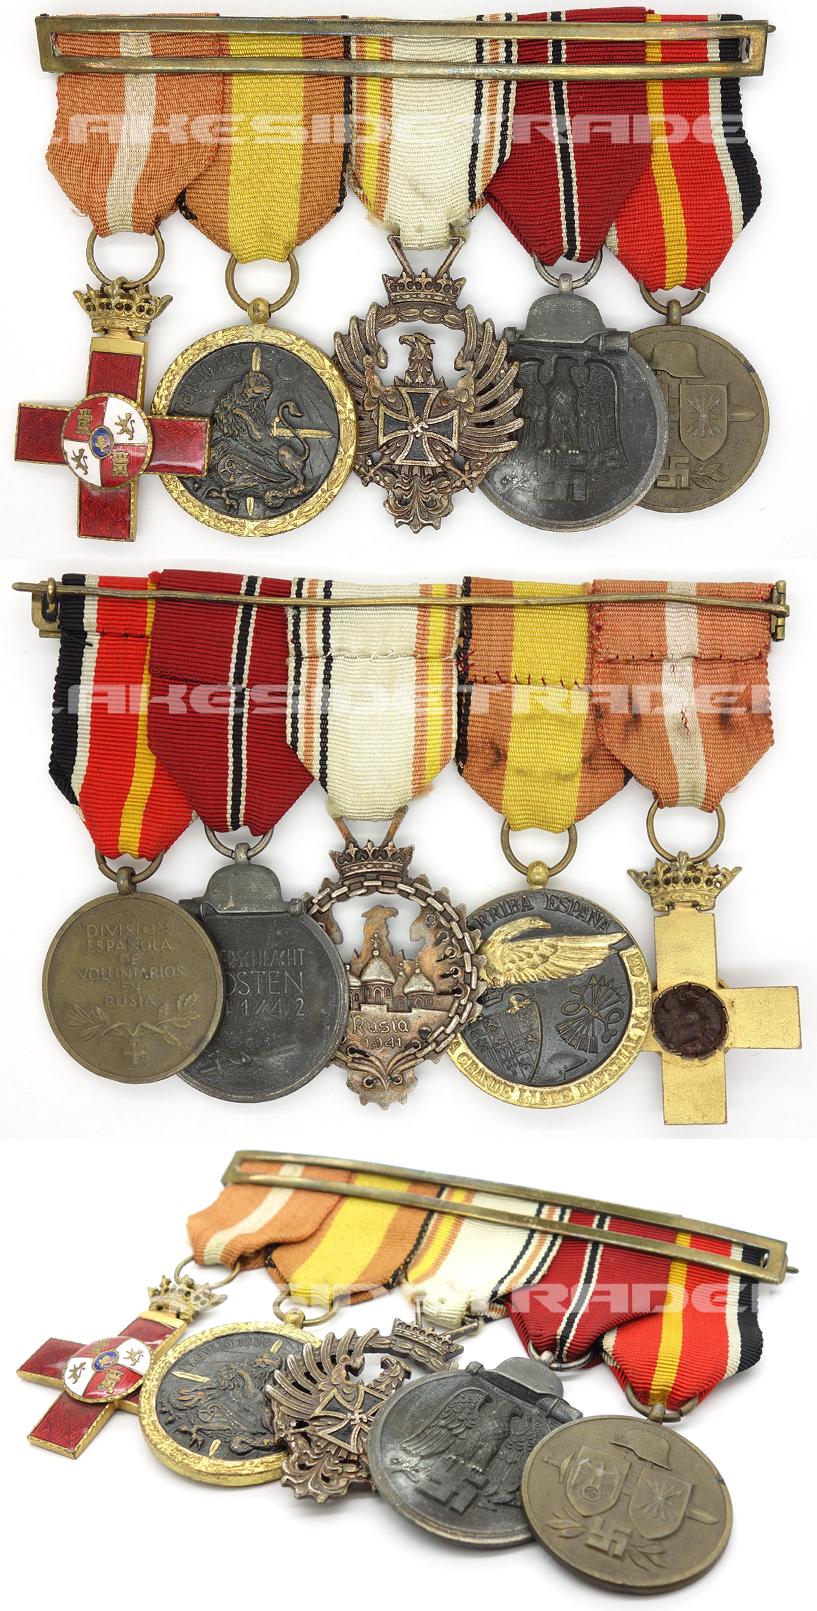 Spanish 'Blue Division' - Five Piece Medal Bar